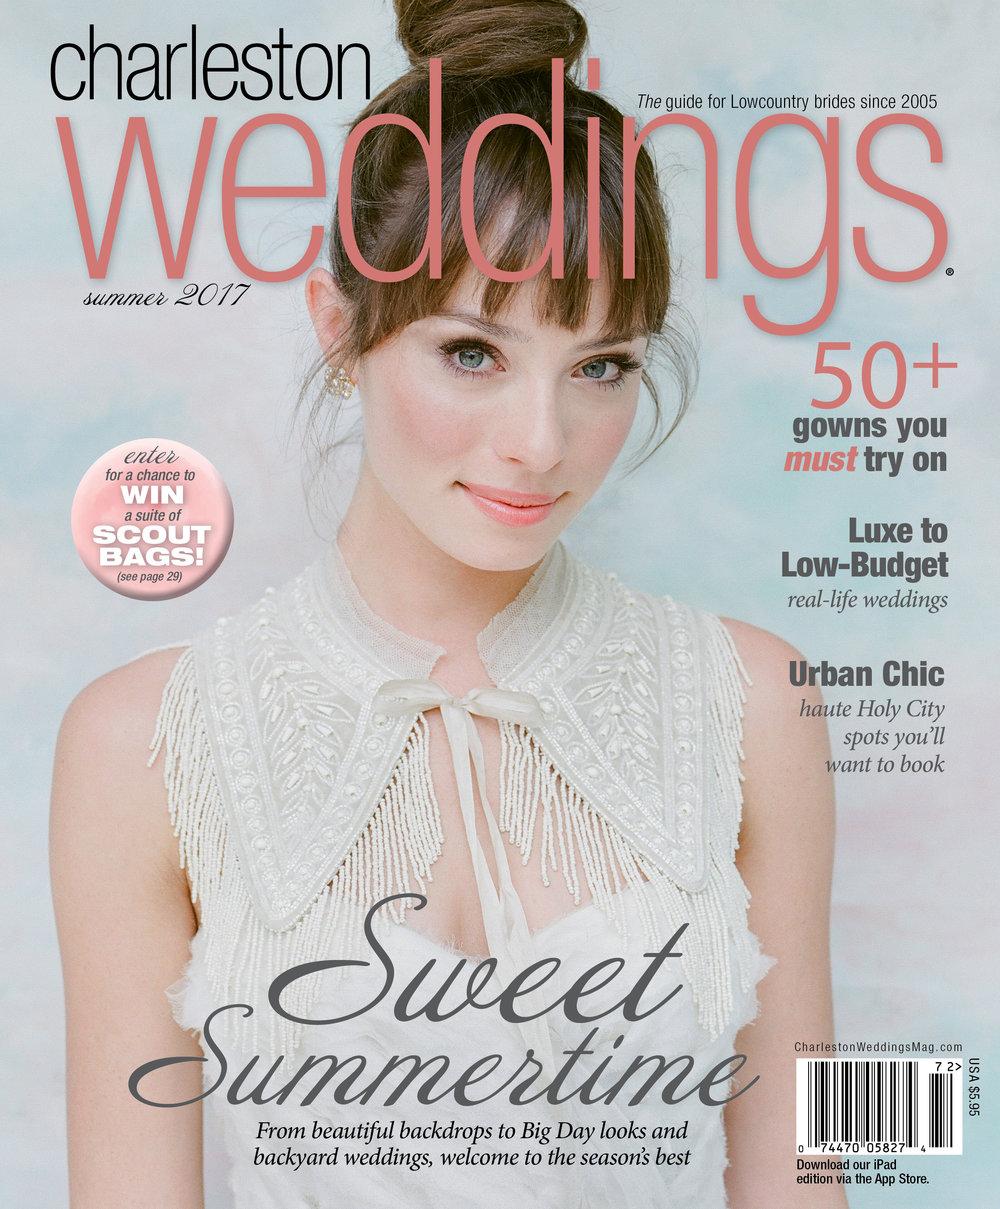 Wedding Media Relations PR